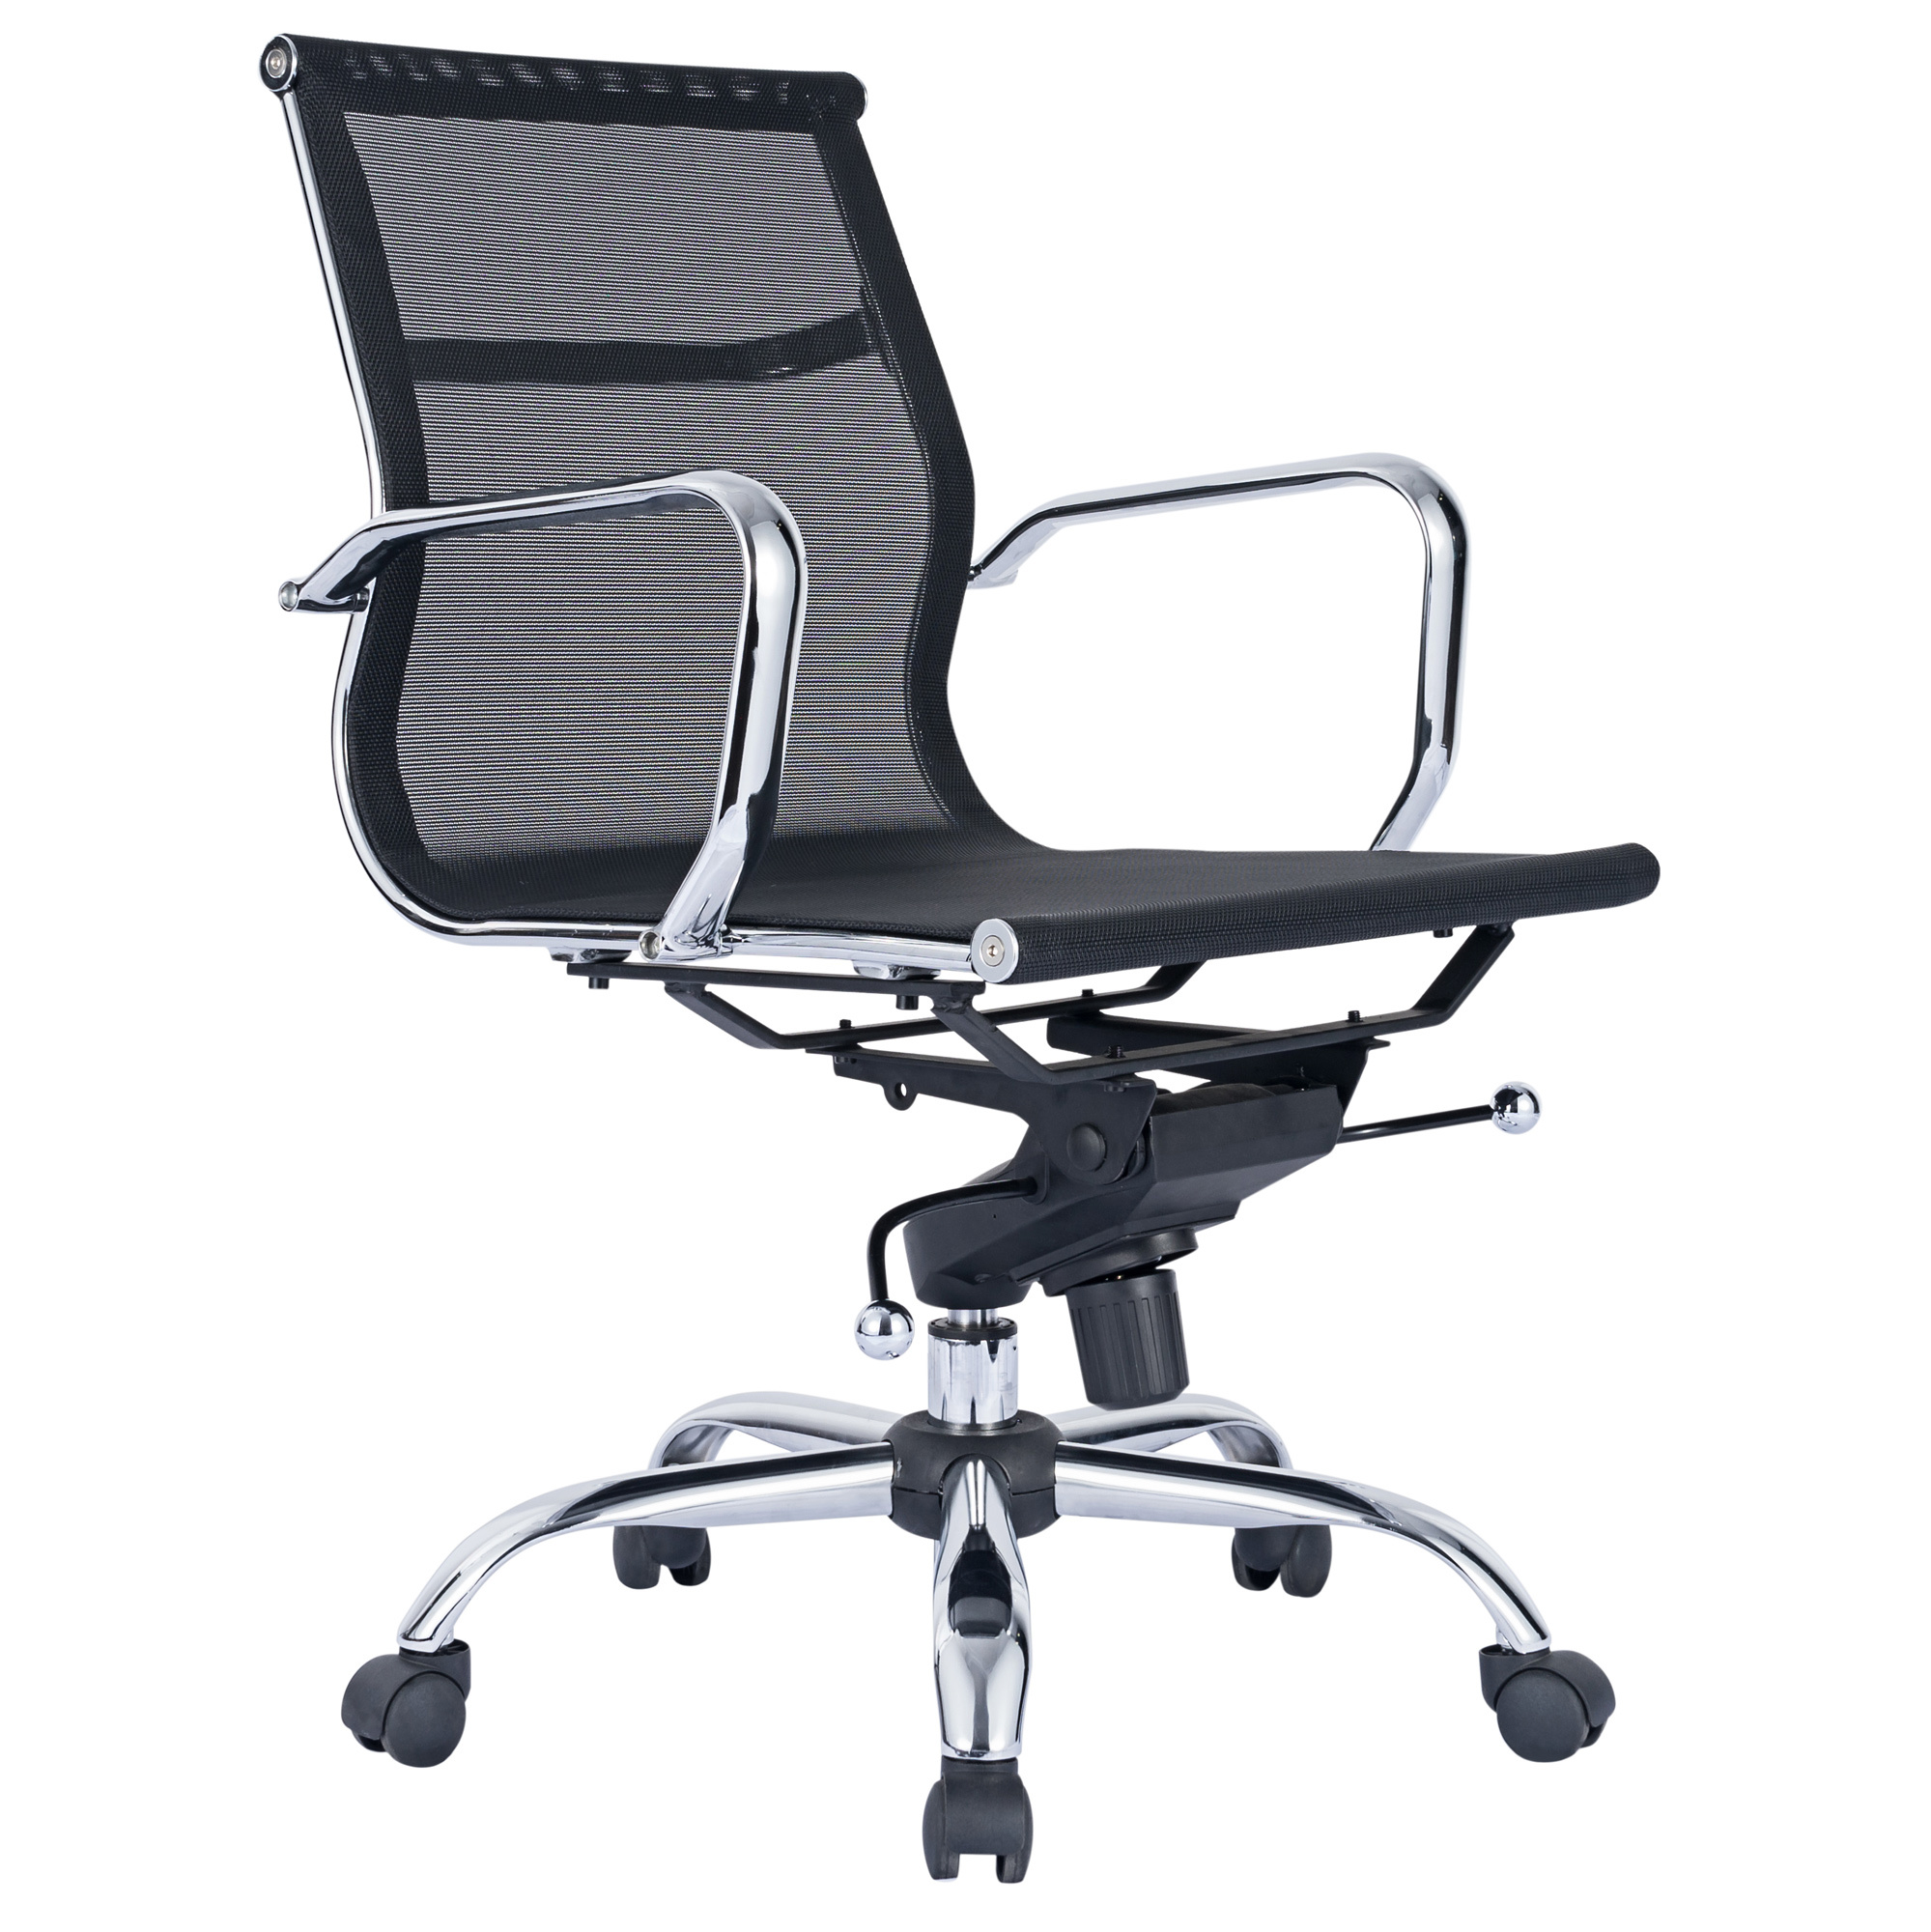 Mesh fice Chairs